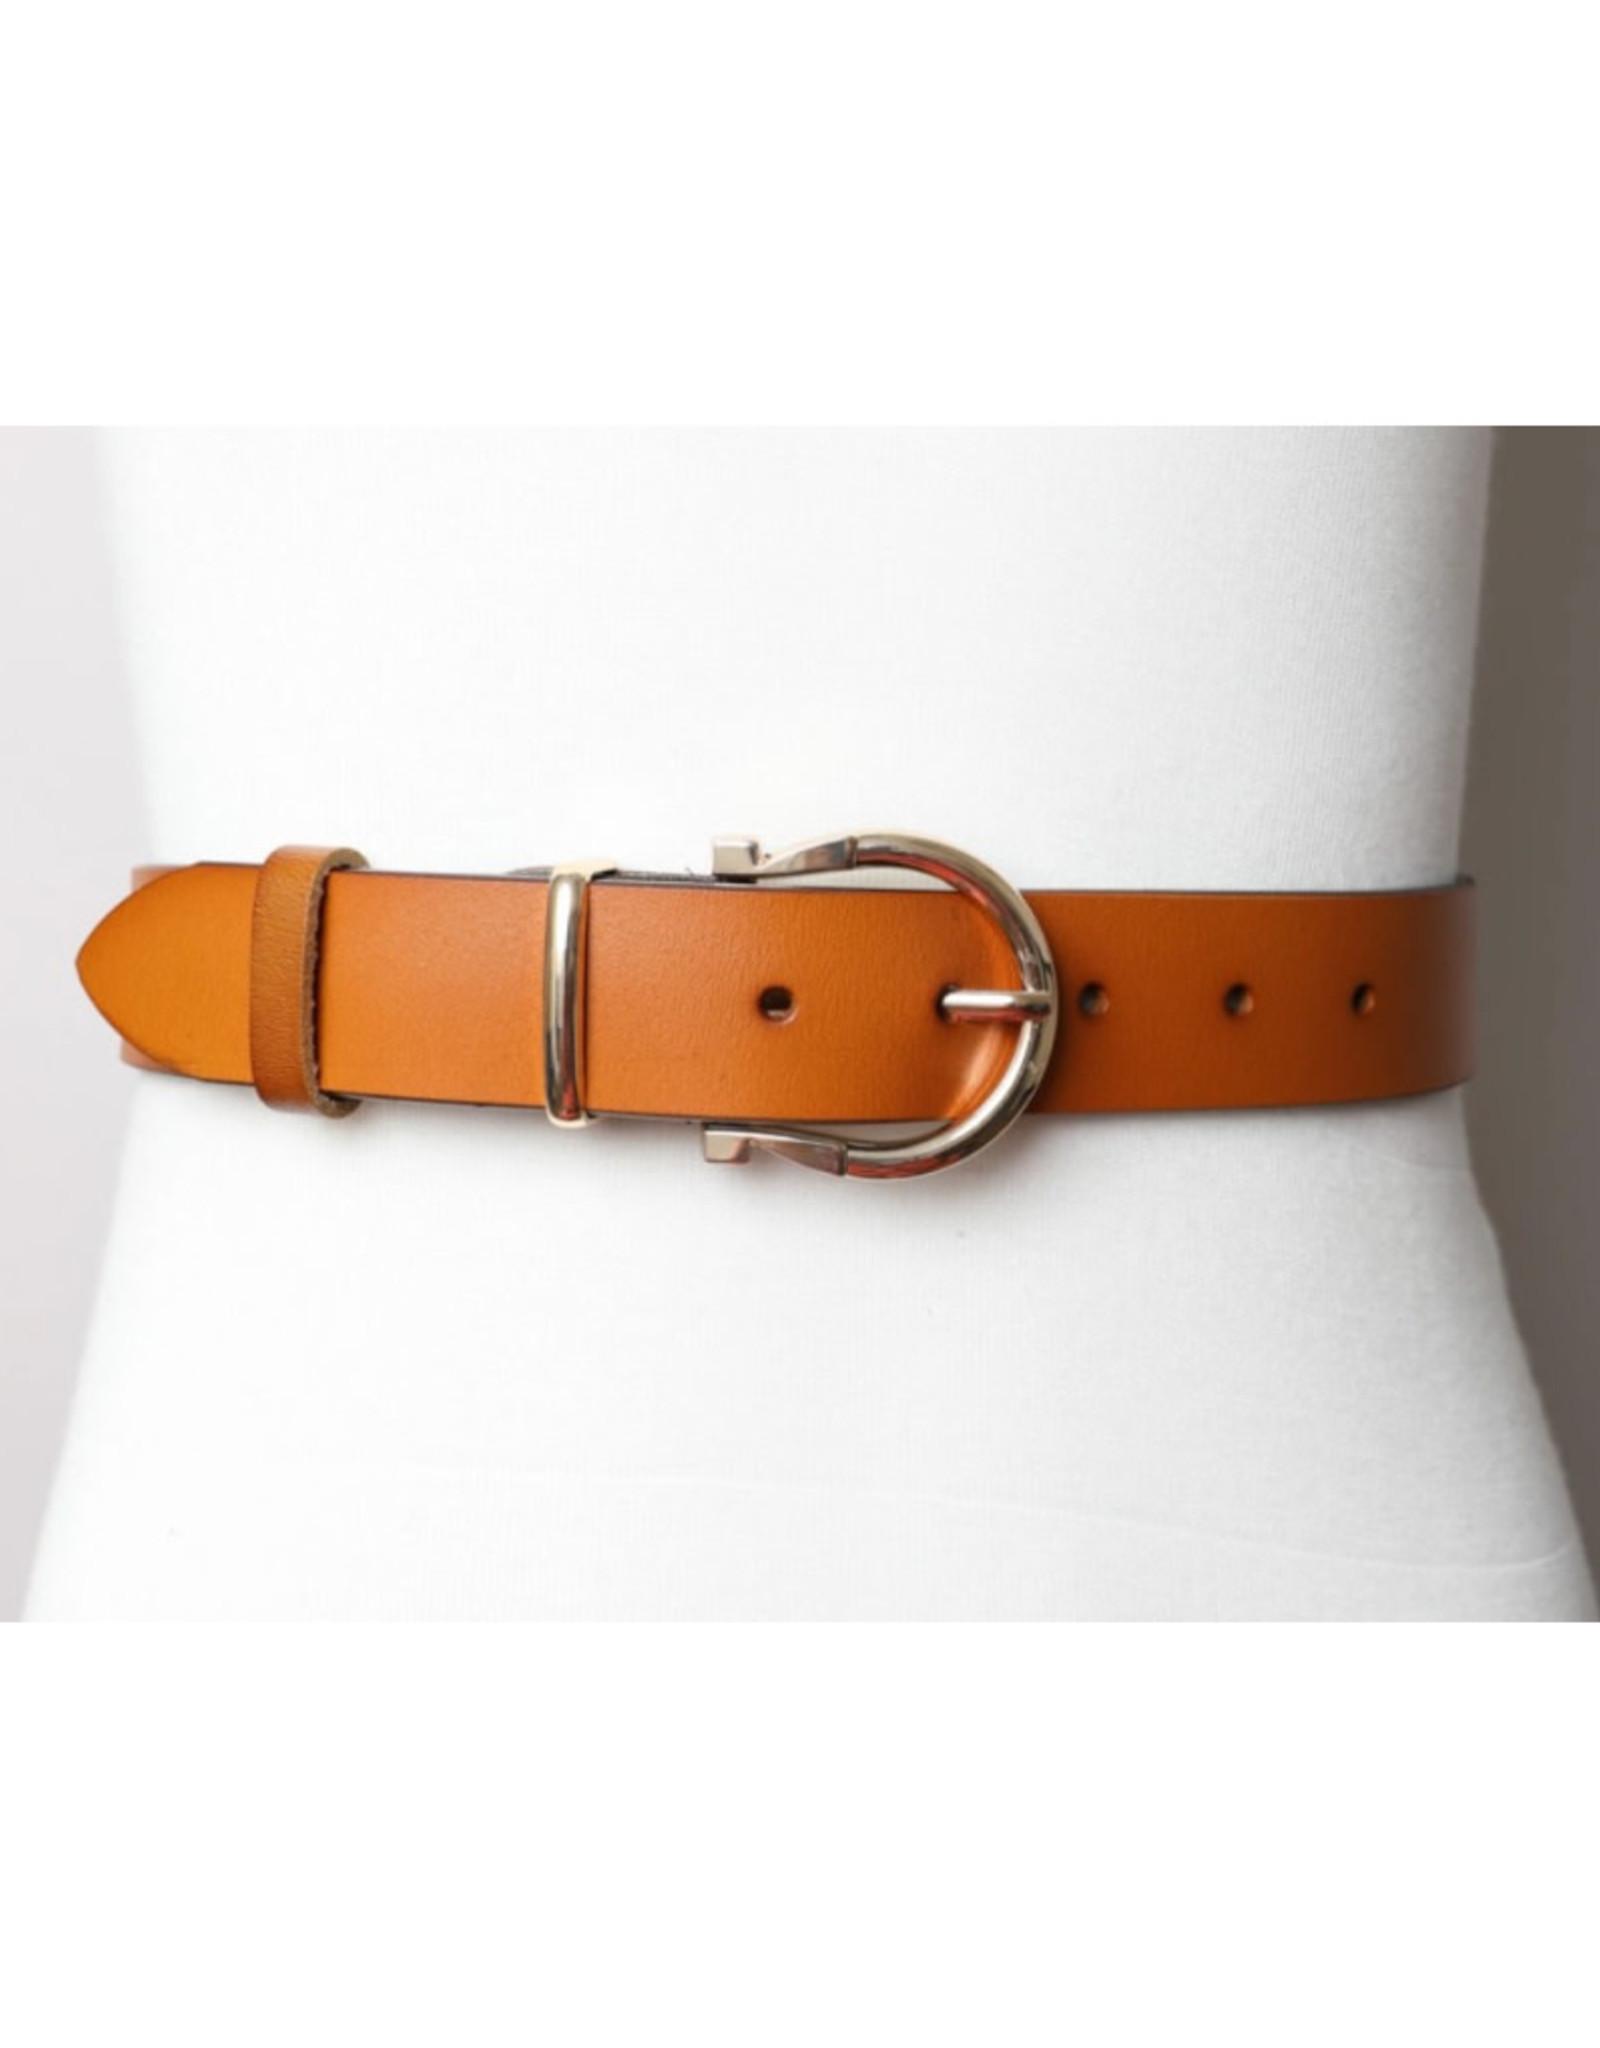 Horseshoe Belt with Gold Buckle